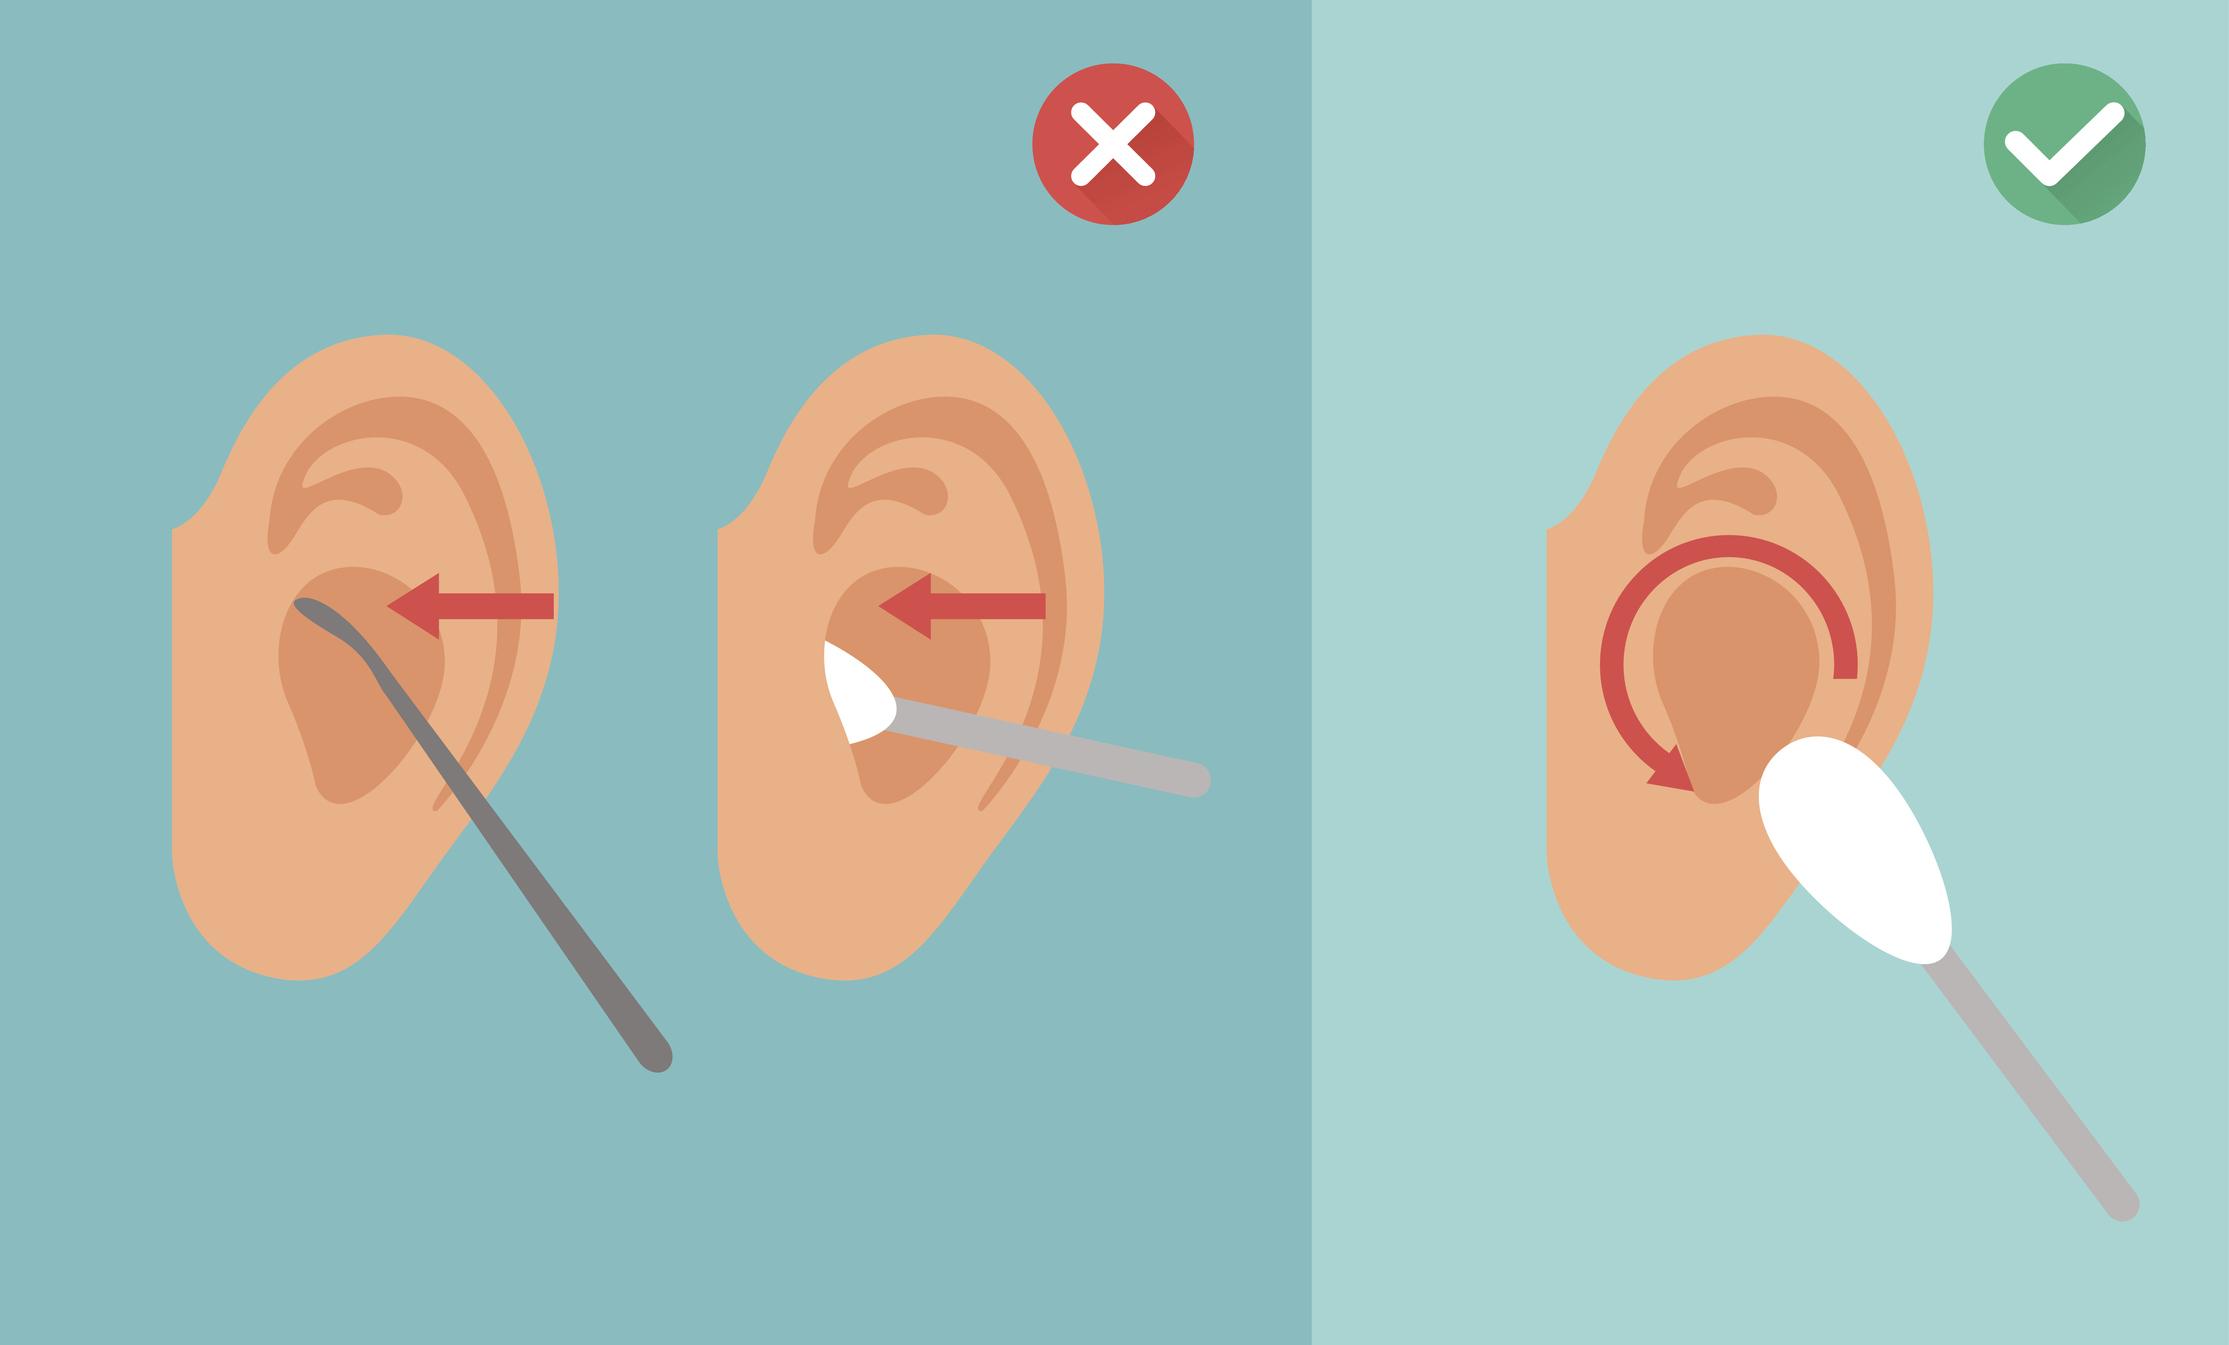 3 reasons to leave earwax alone - Harvard Health Blog